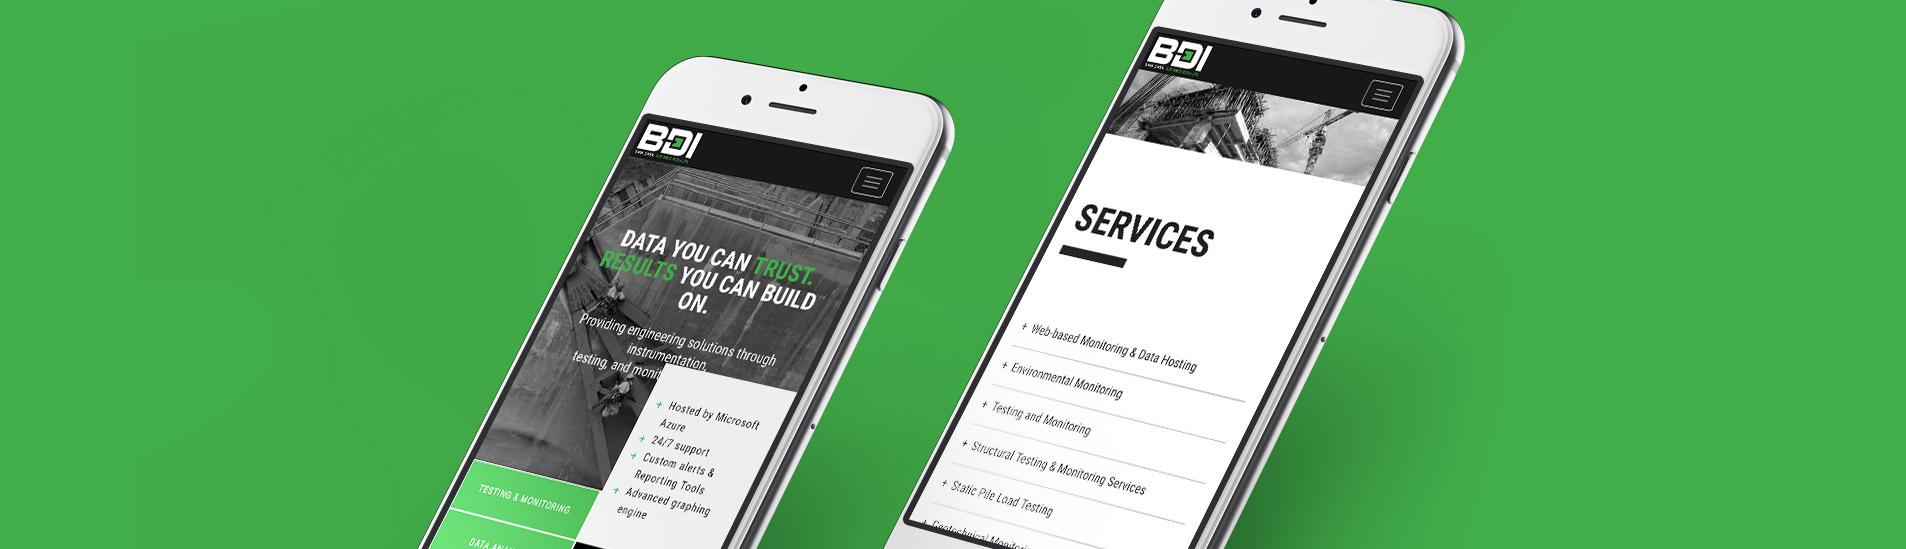 mobile website design for bdi